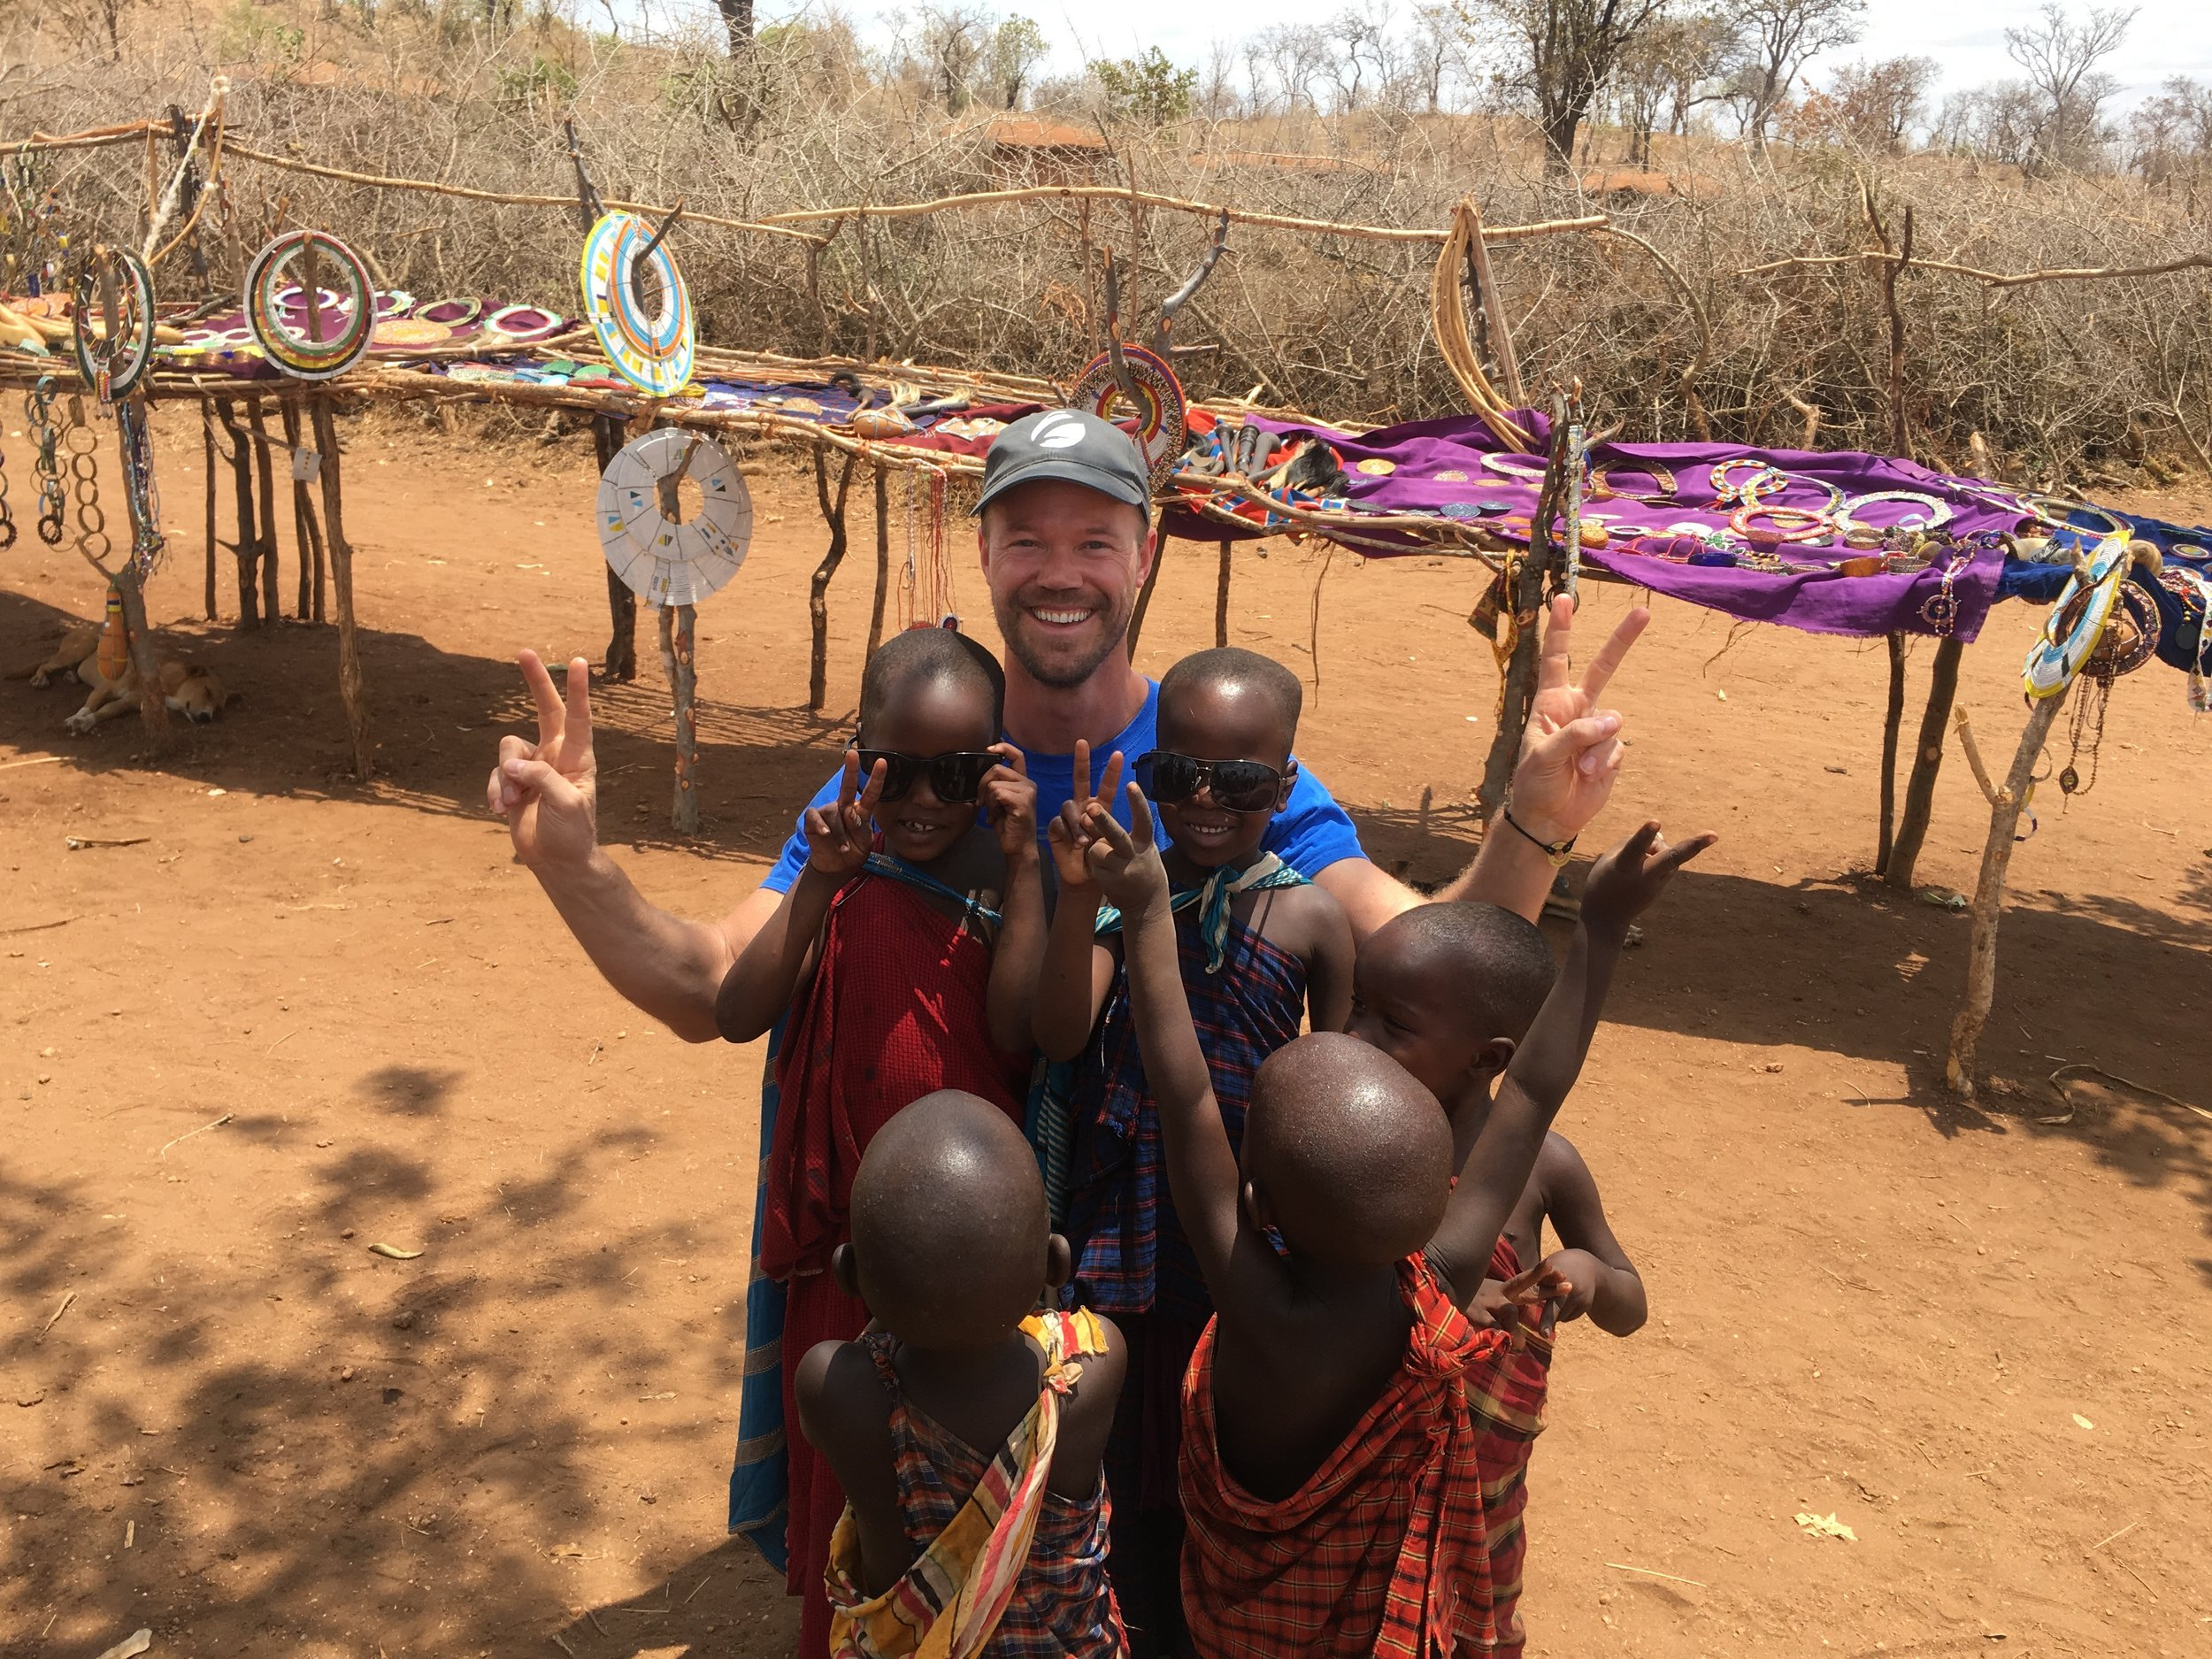 New friends in Tanzania